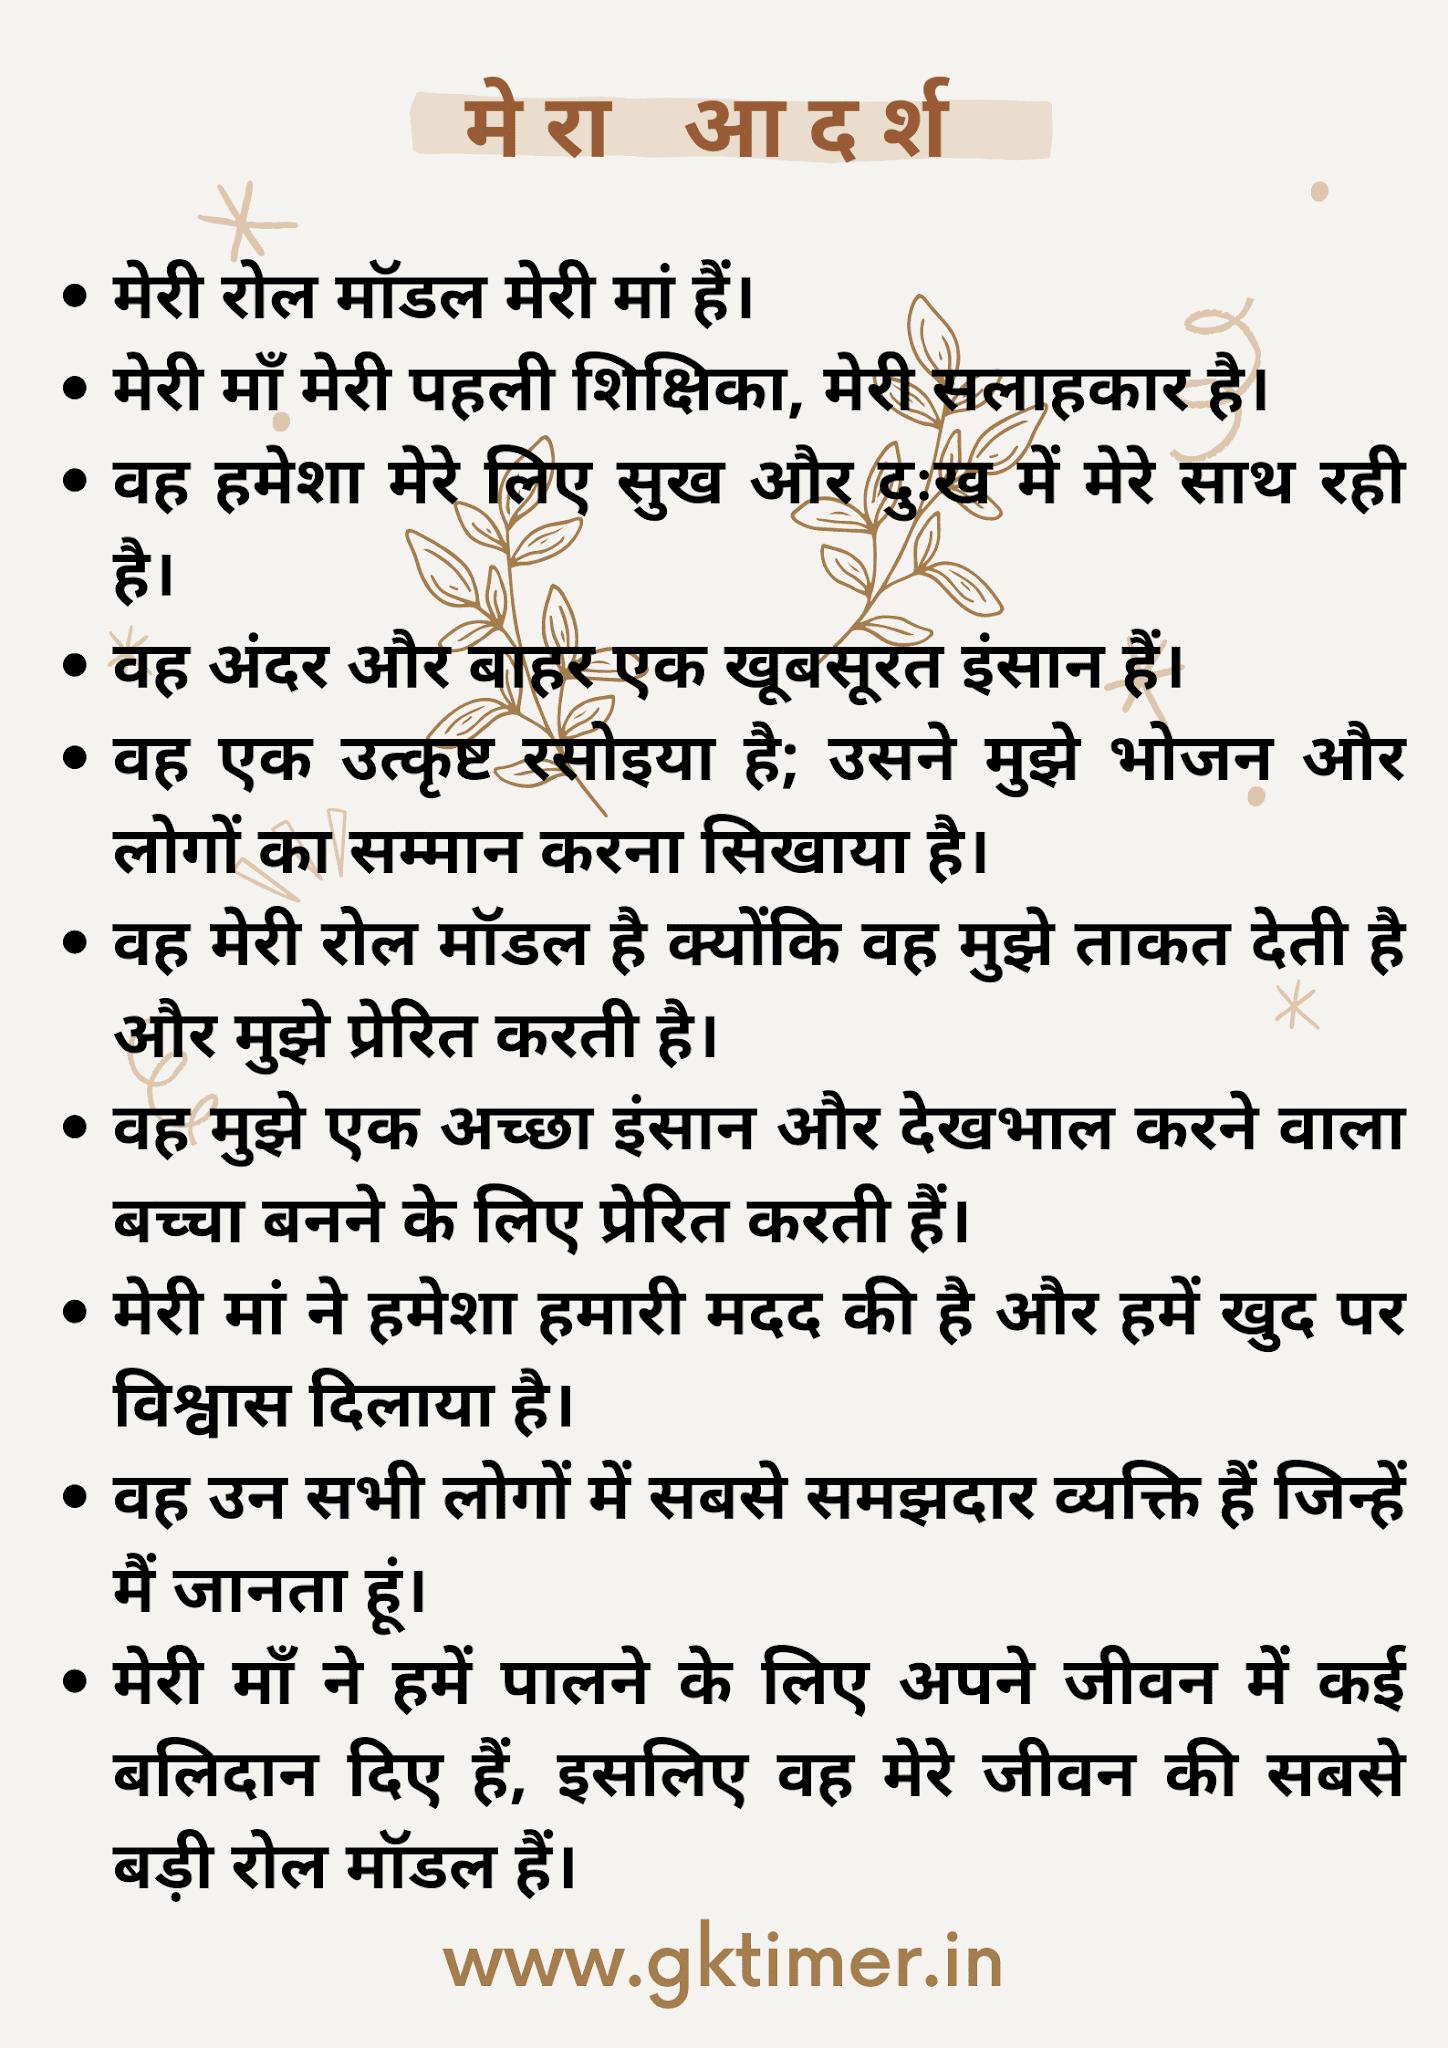 मेरा आदर्श पर निबंध | Essay on My Role Model  in Hindi | 10 Lines on My  Role Model in Hindi